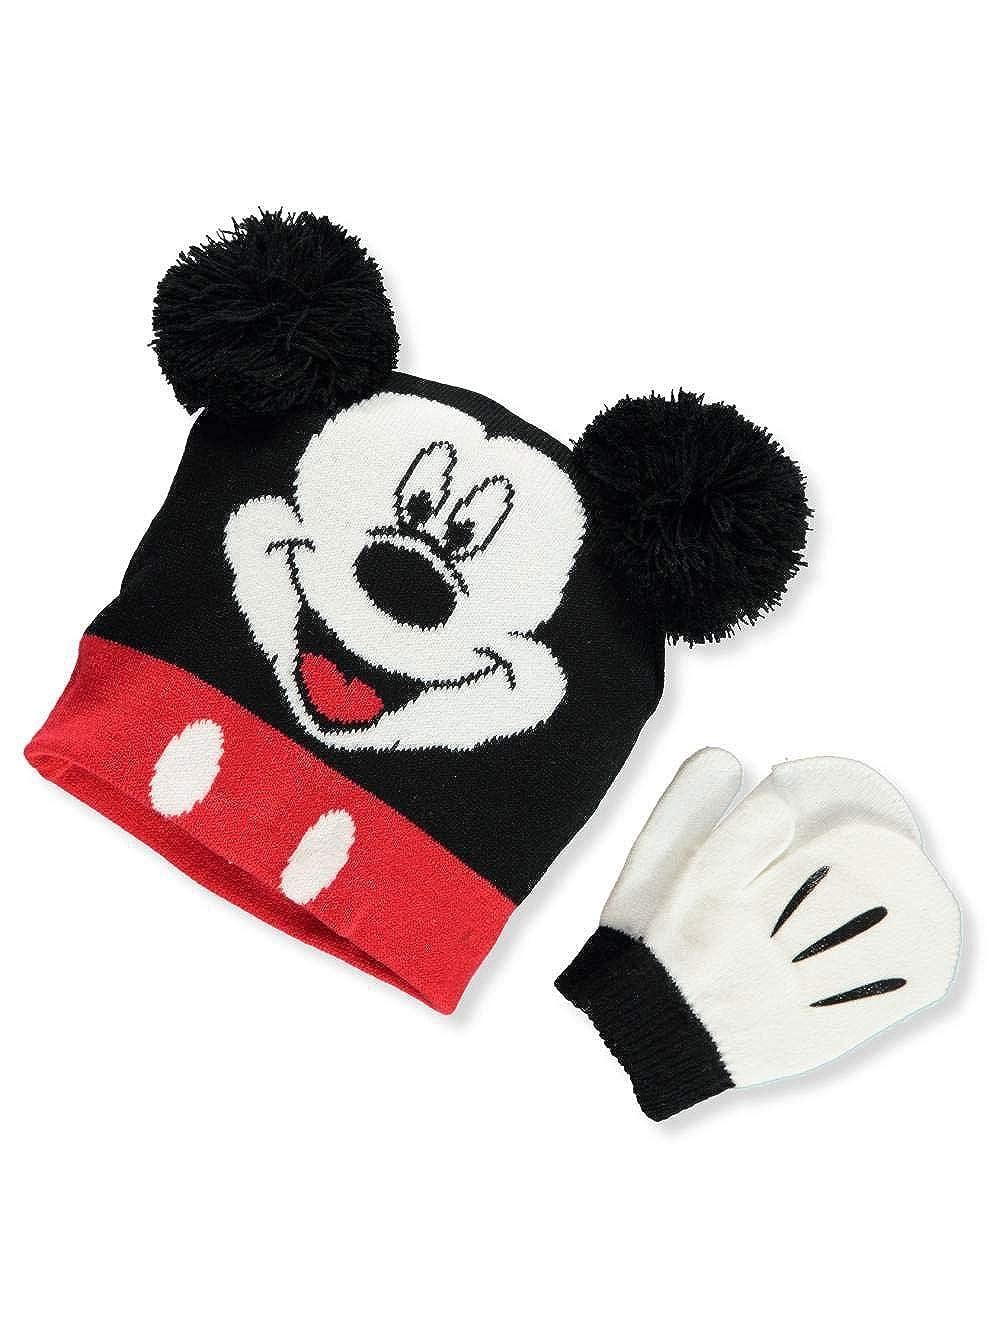 Disney Mickey Mouse Boys' Beanie & Mittens Set one size